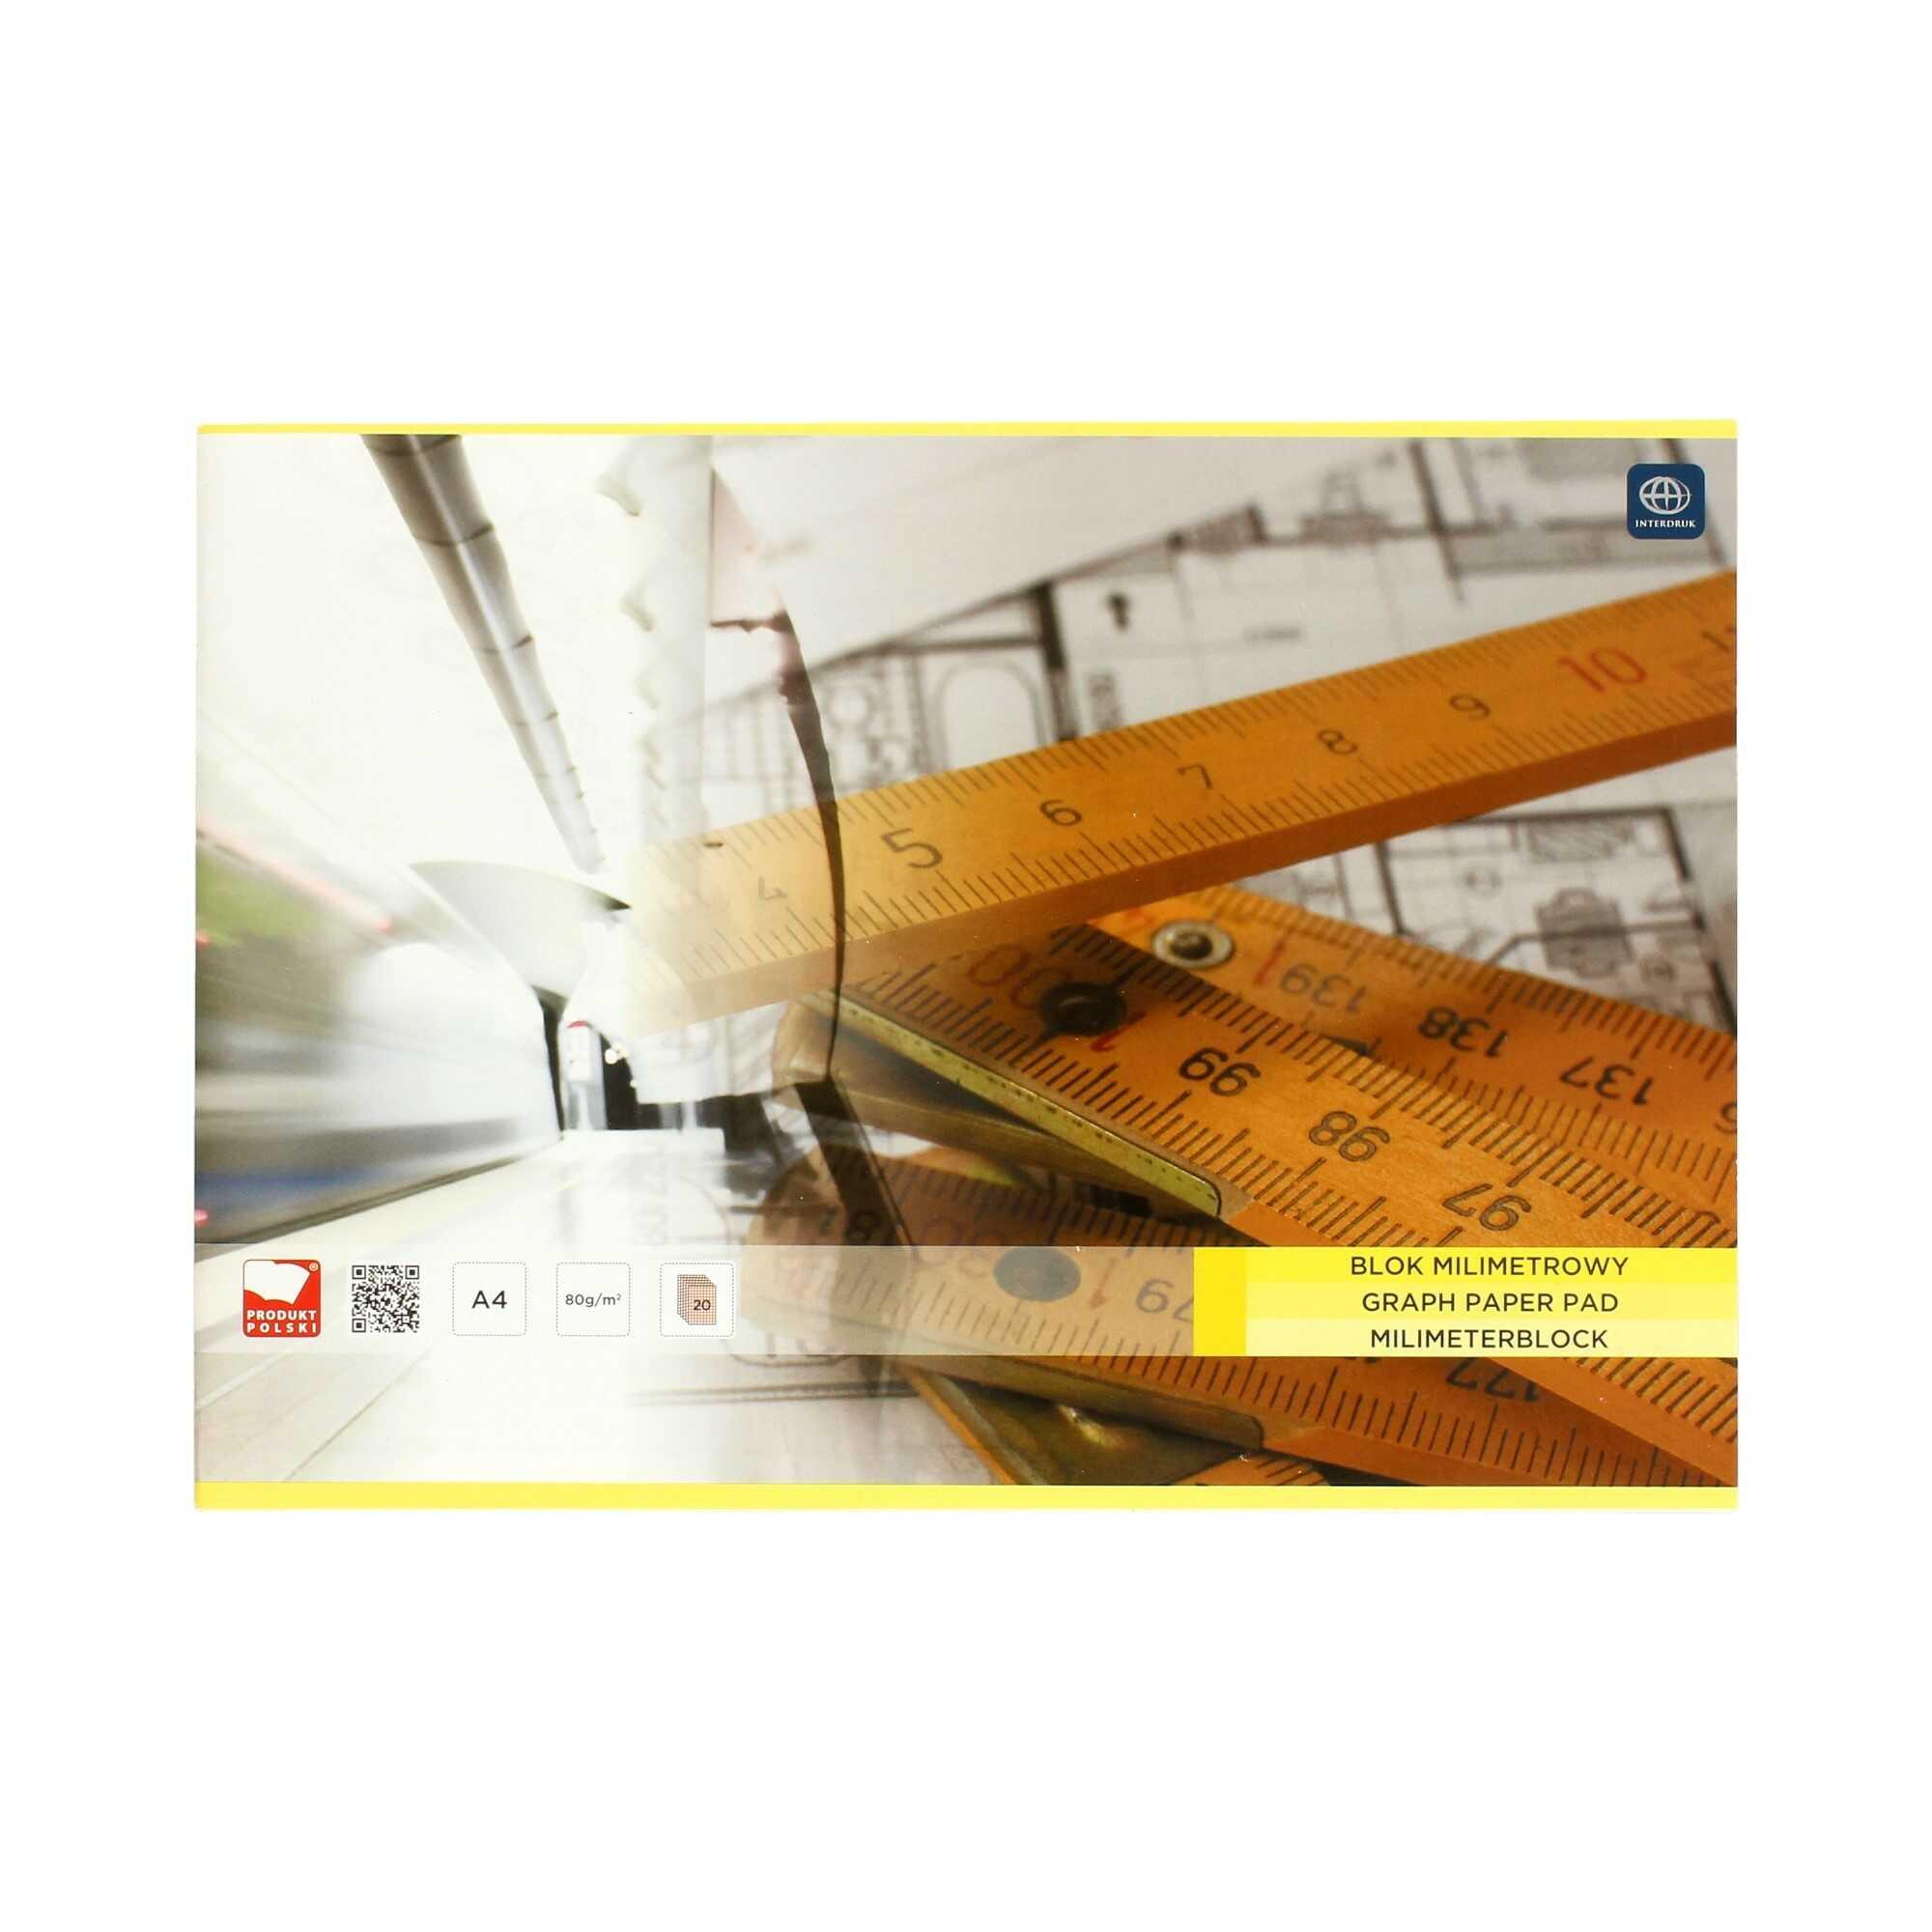 Blok milimetrowy A4/20 Interdruk